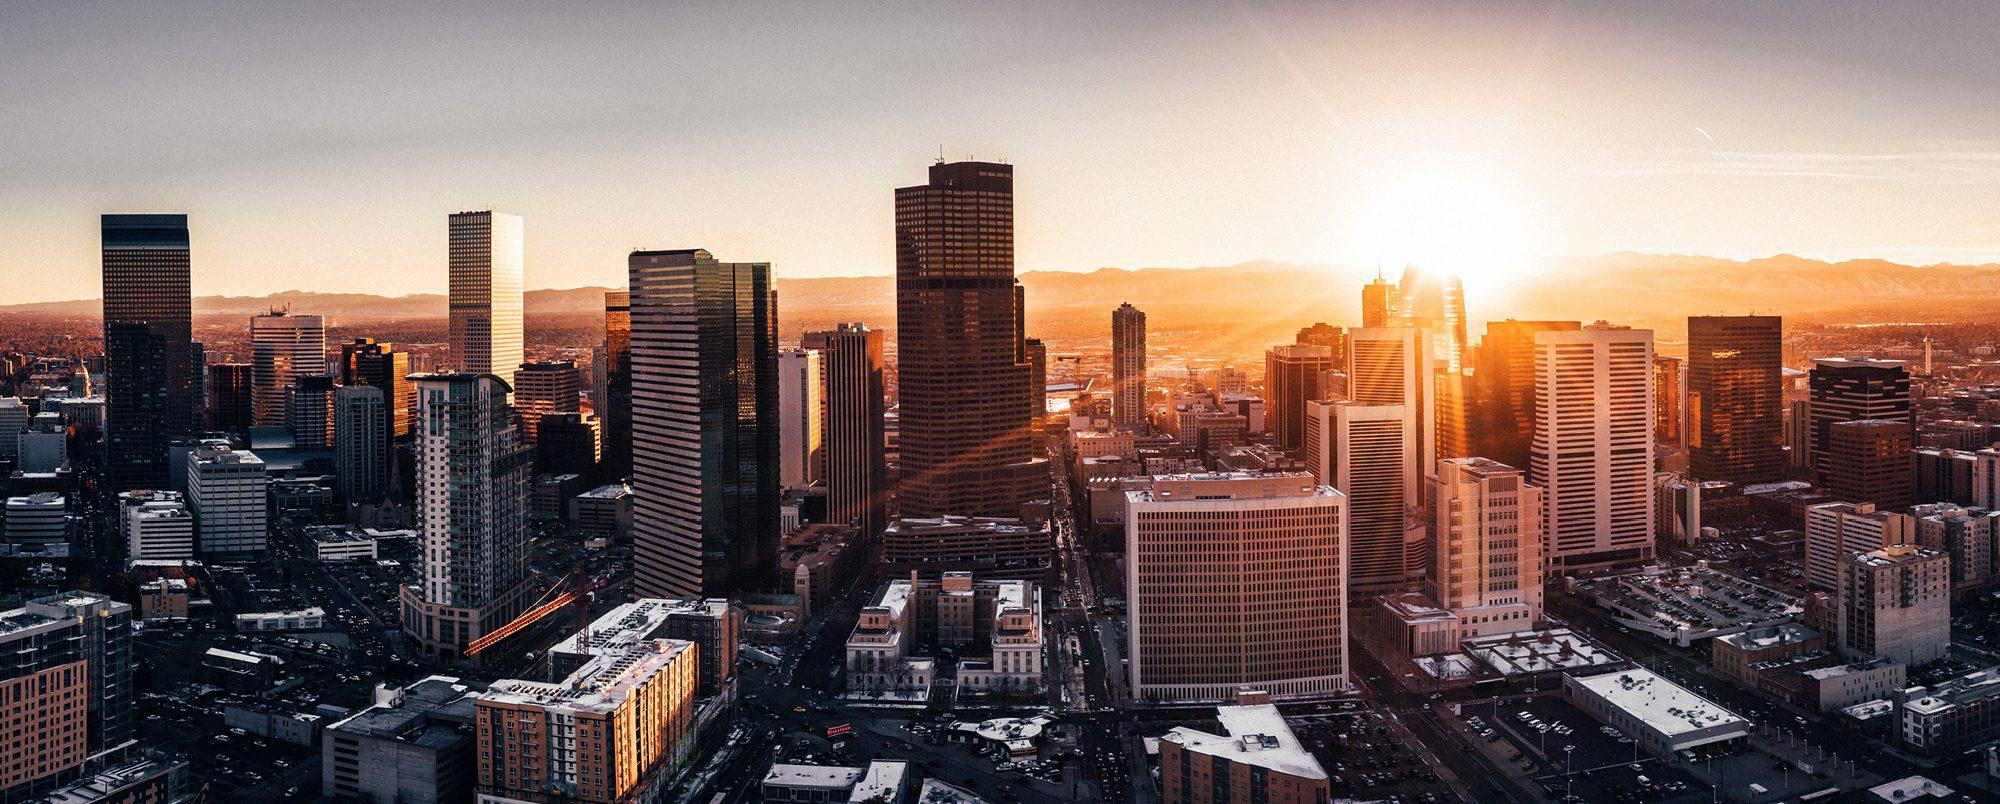 City of Denver at Sunrise